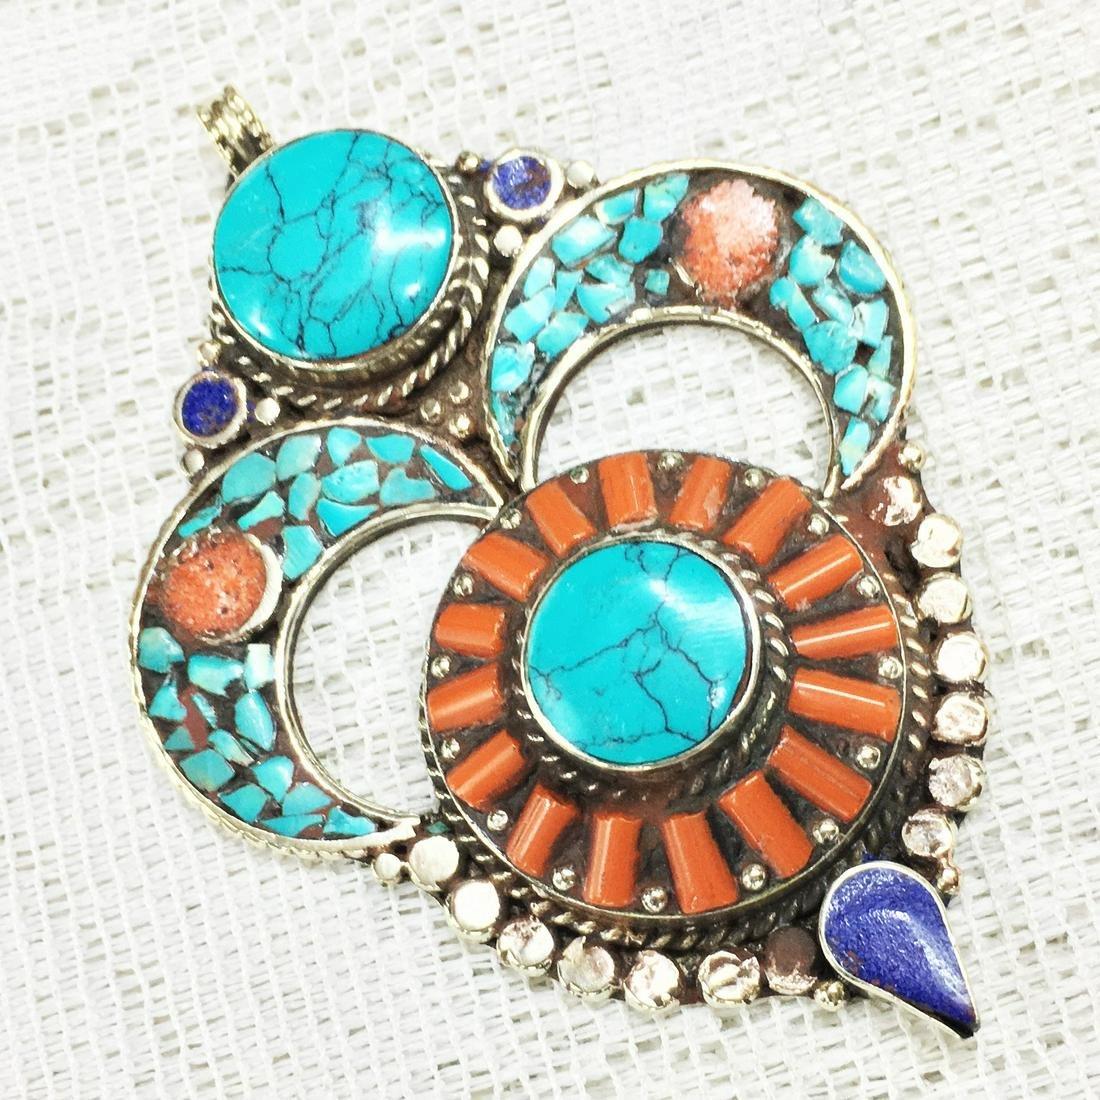 Tibetan Ethnic Tibetan Silver Turquoise & Amber Pendant